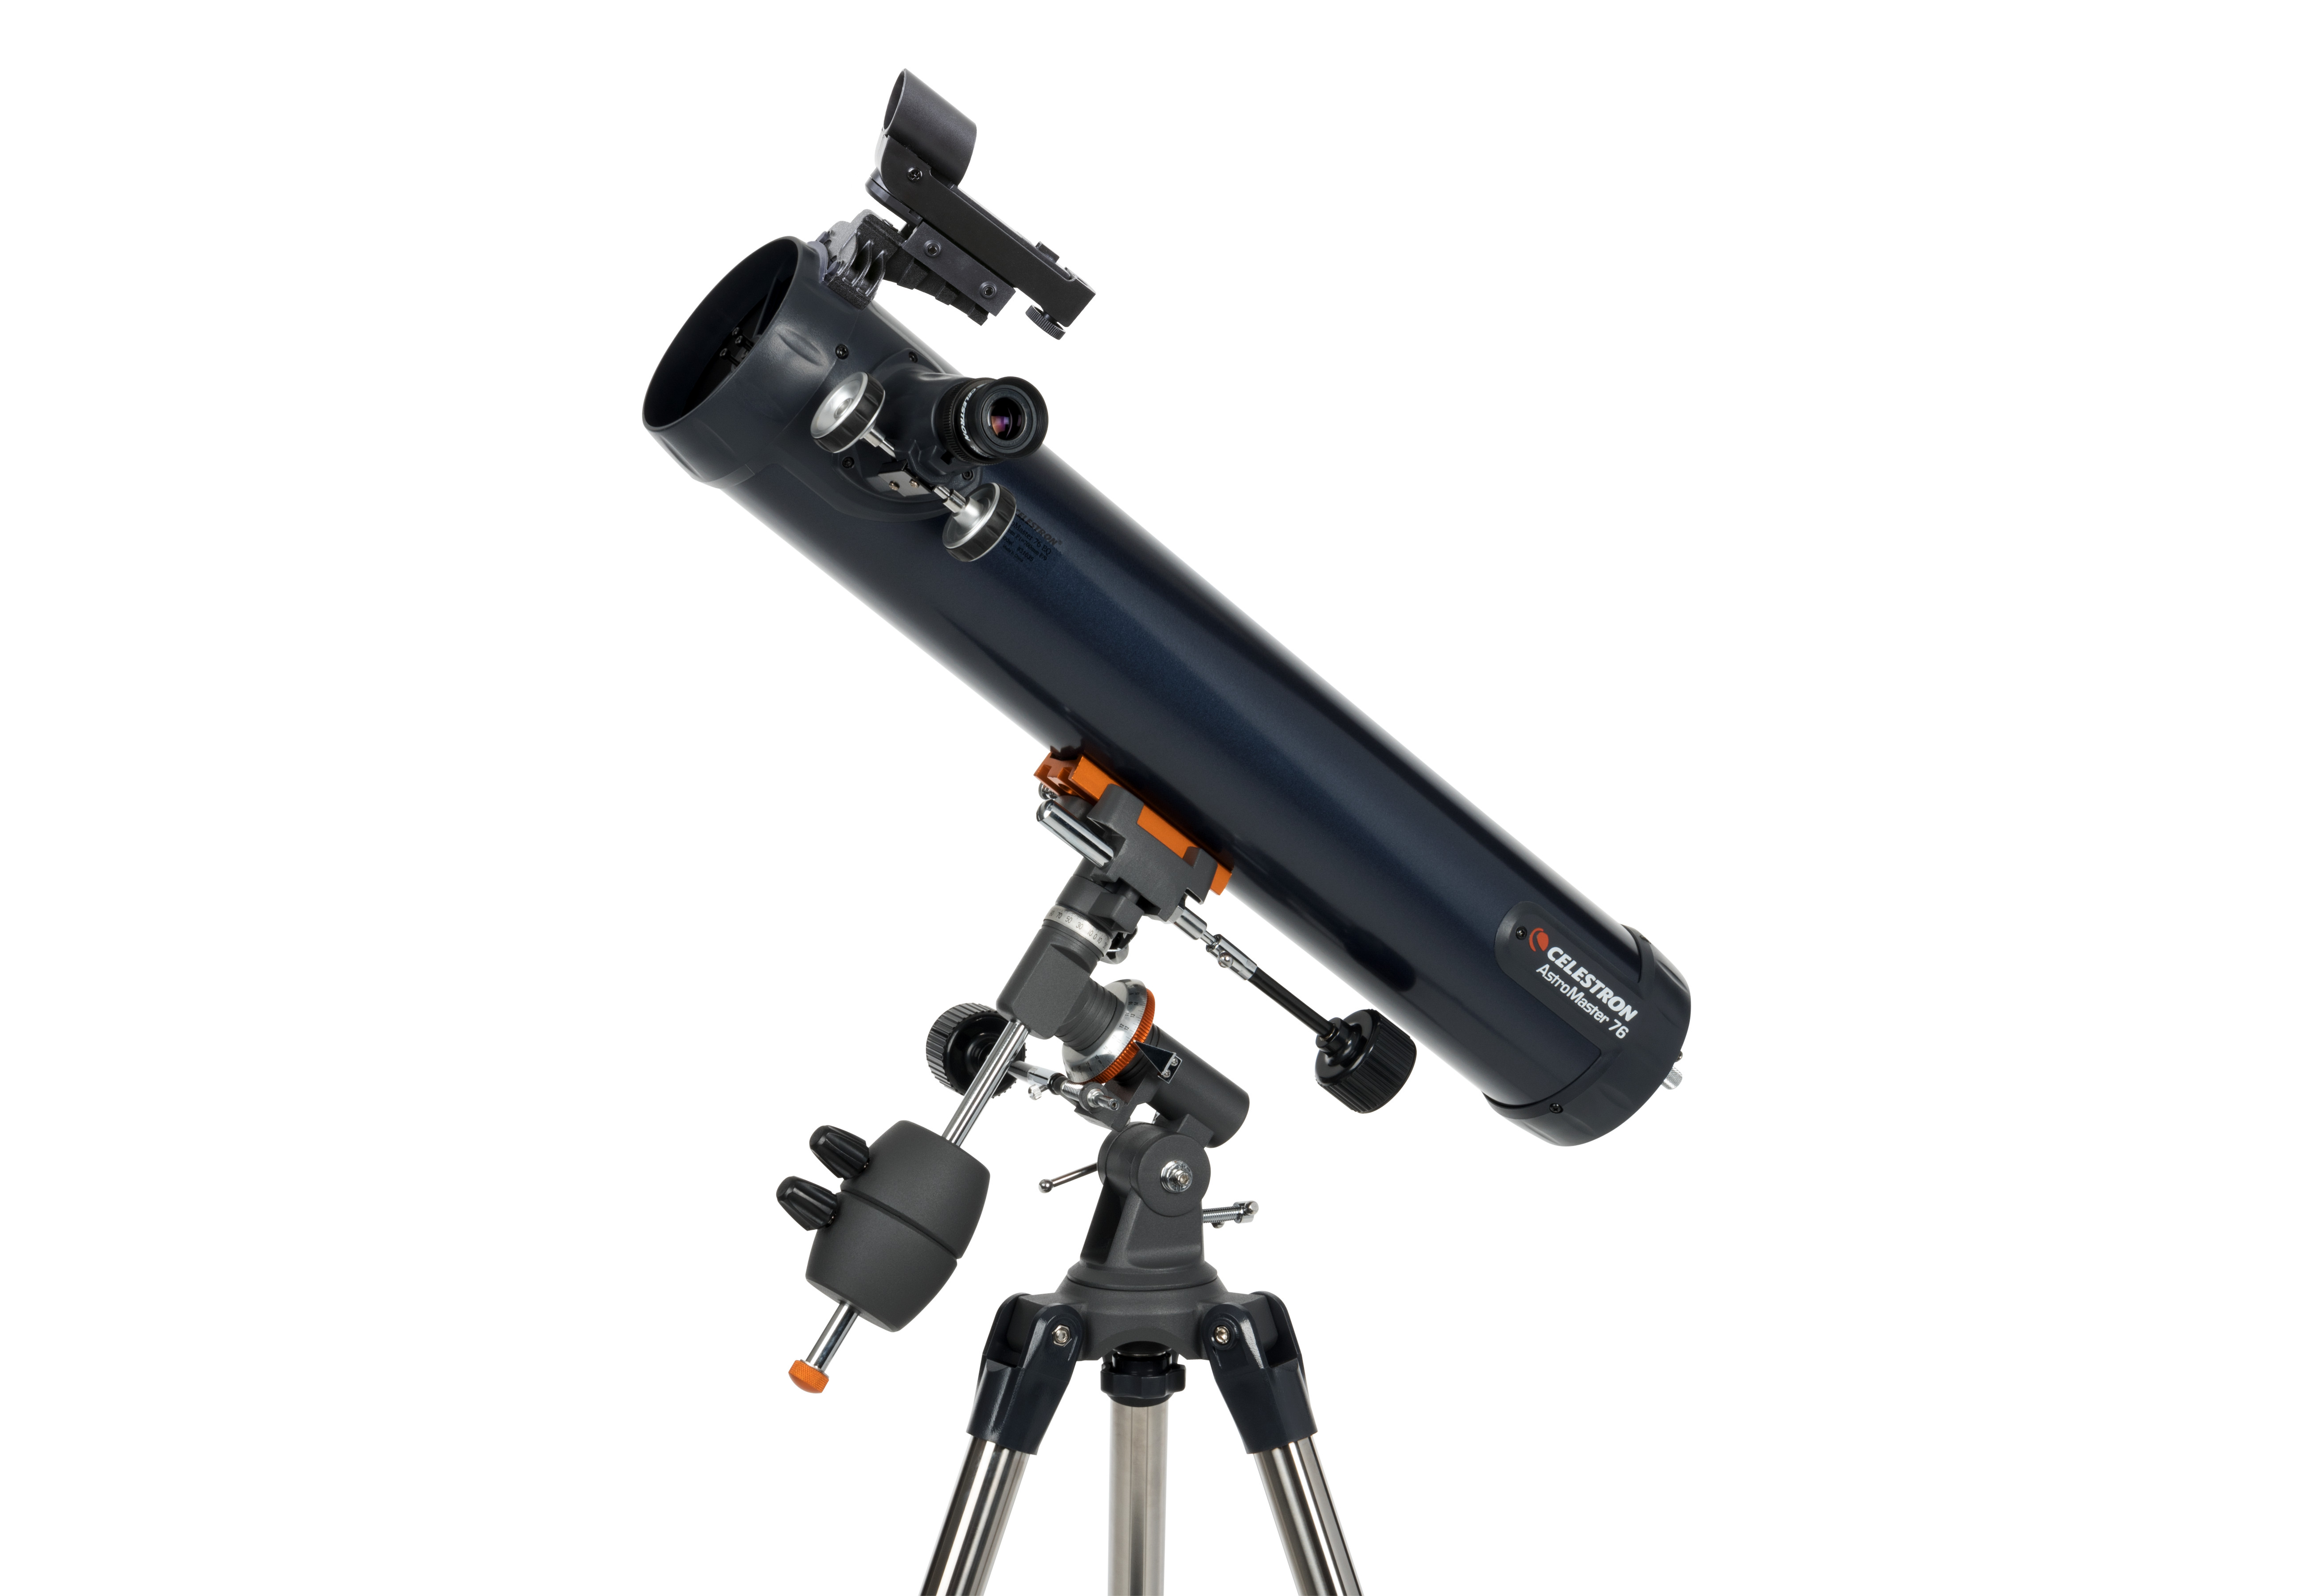 Celestron astromaster eq md reflector telescope with motor drive